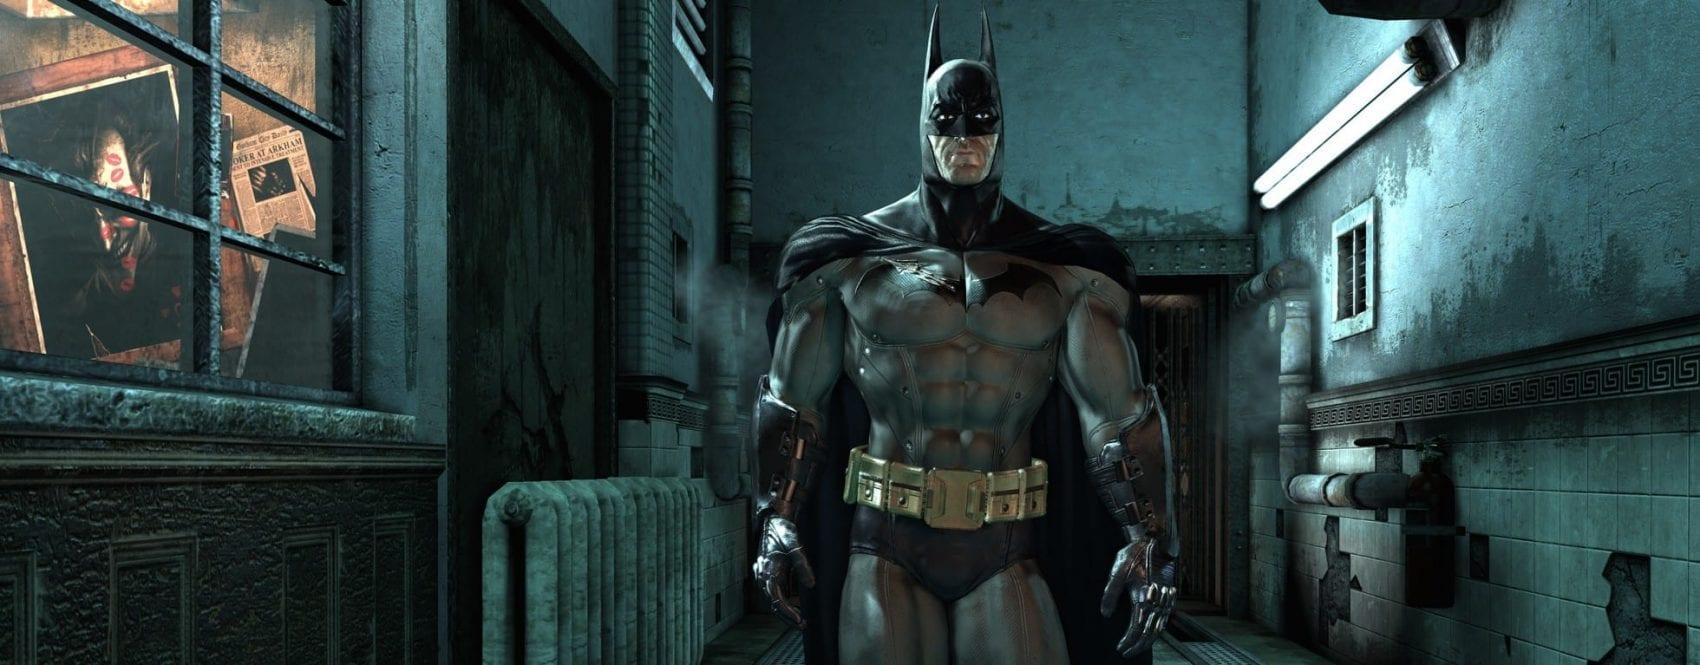 Batman Return to Arkham News My Geek Actu 5